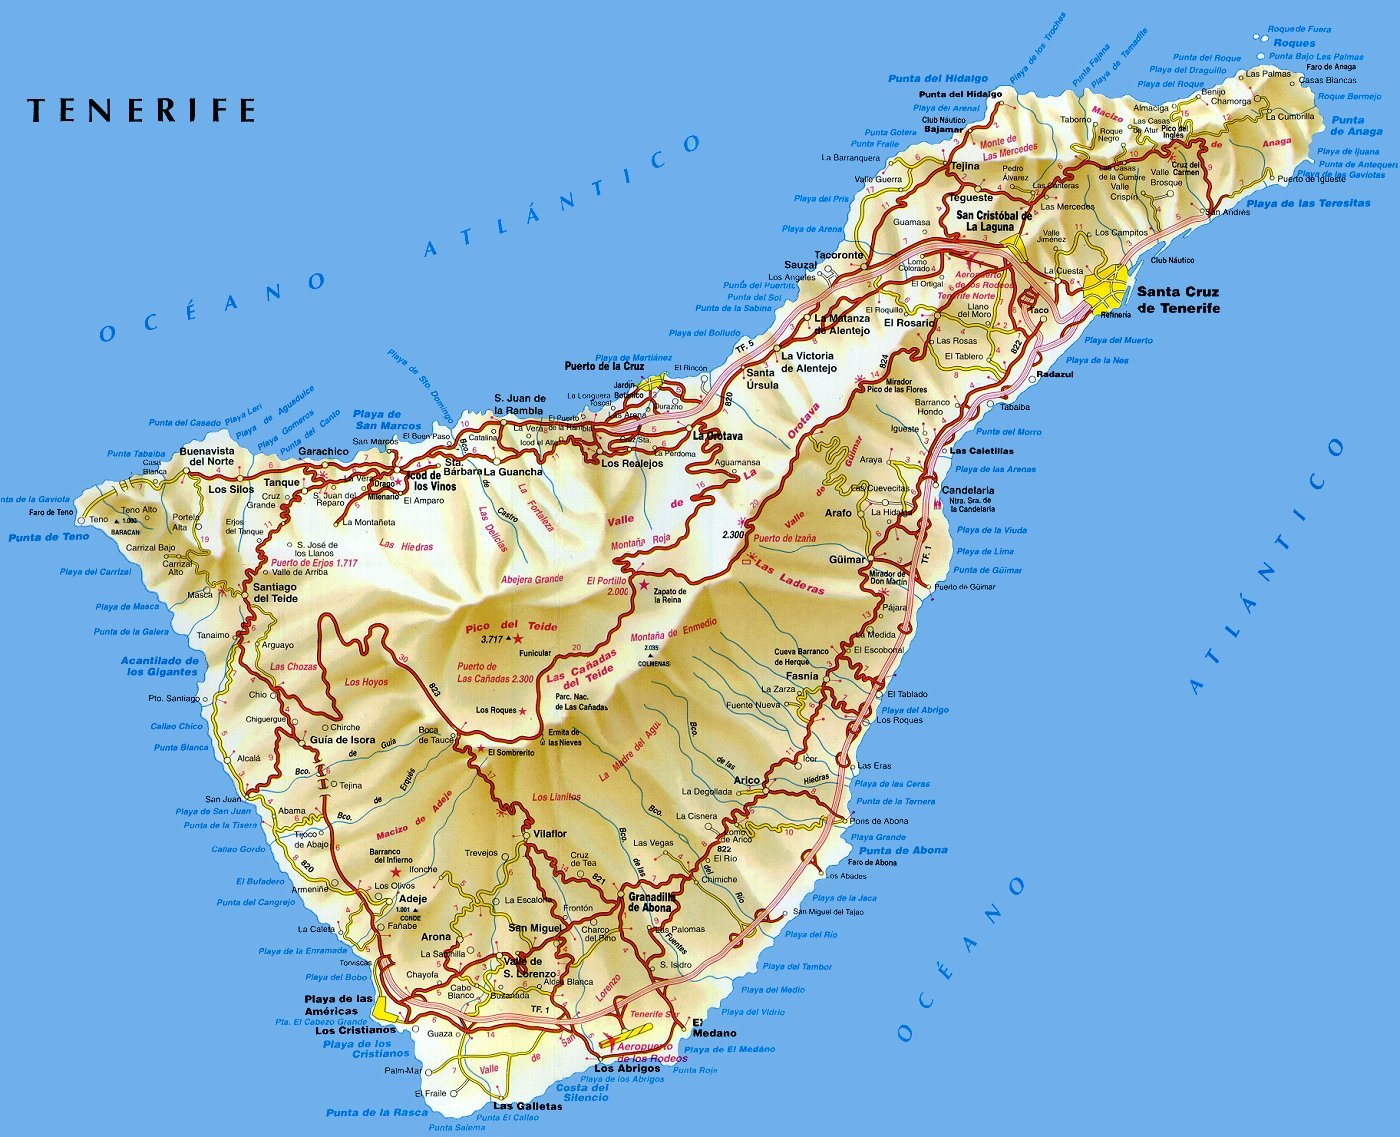 Карта Санта-Крус-де-Тенерифе со спутника - улицы и